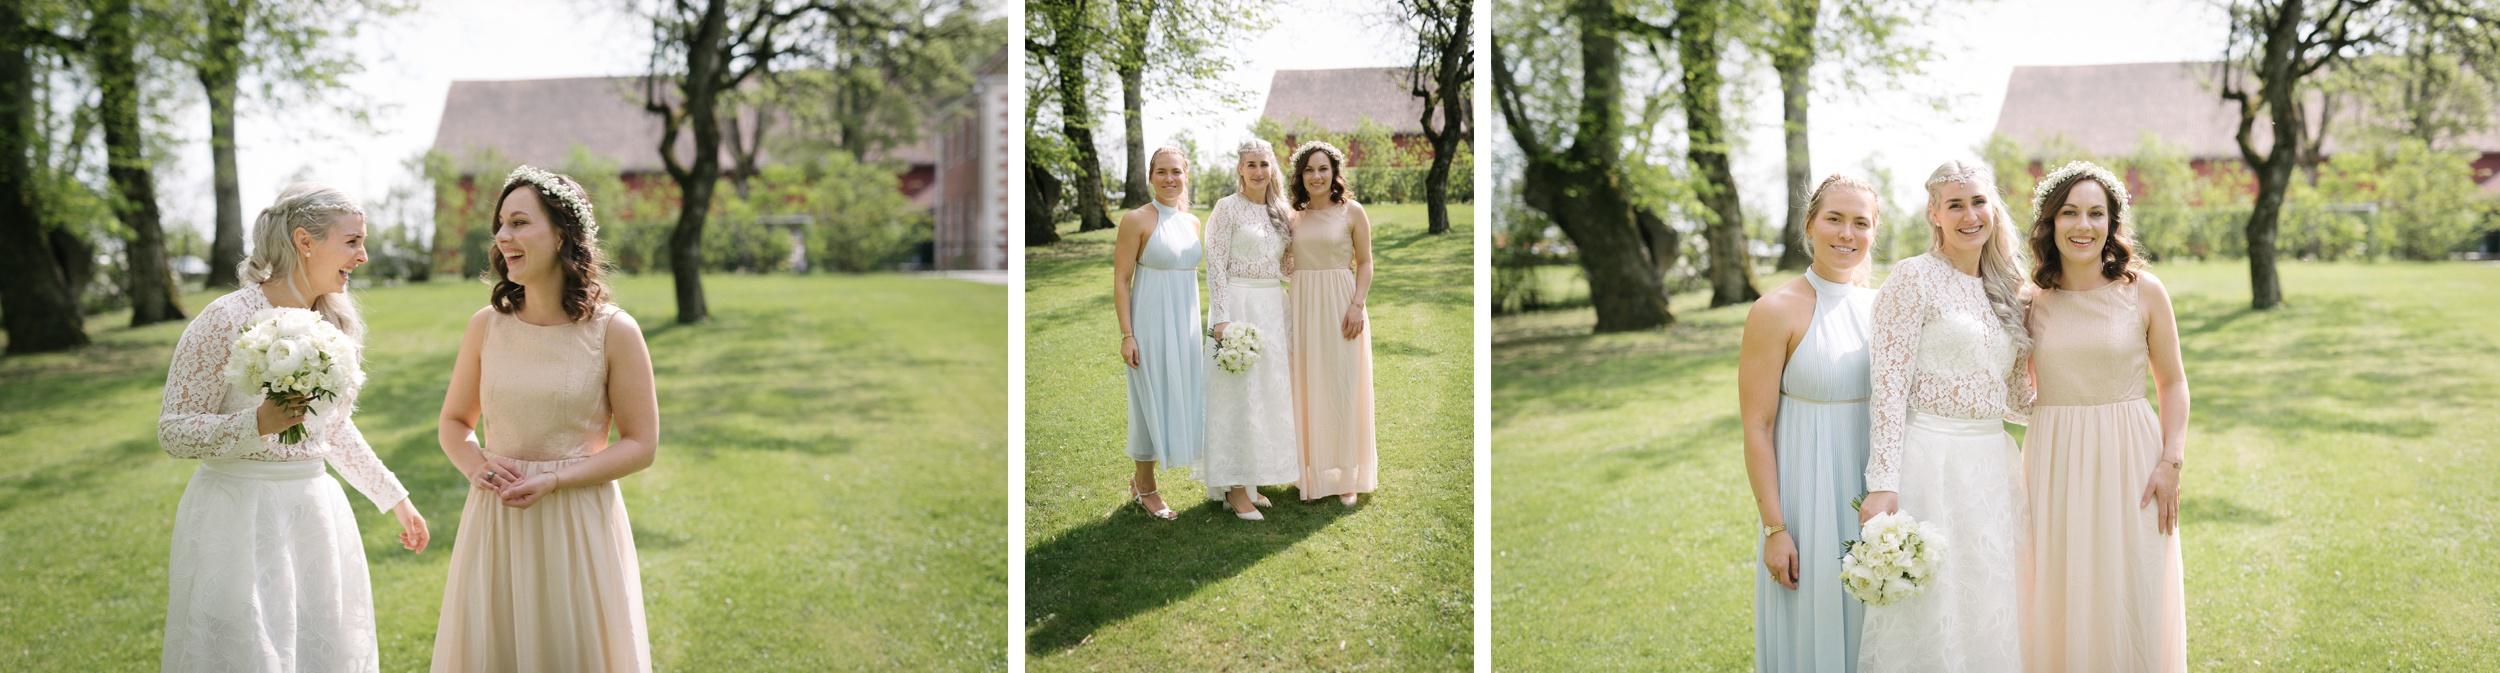 bryllup-bryllupsfotografering-bryllupsfotograf-sarpsborg-20170520-_H2A1220Camilla-og-ruben_WEB.jpg